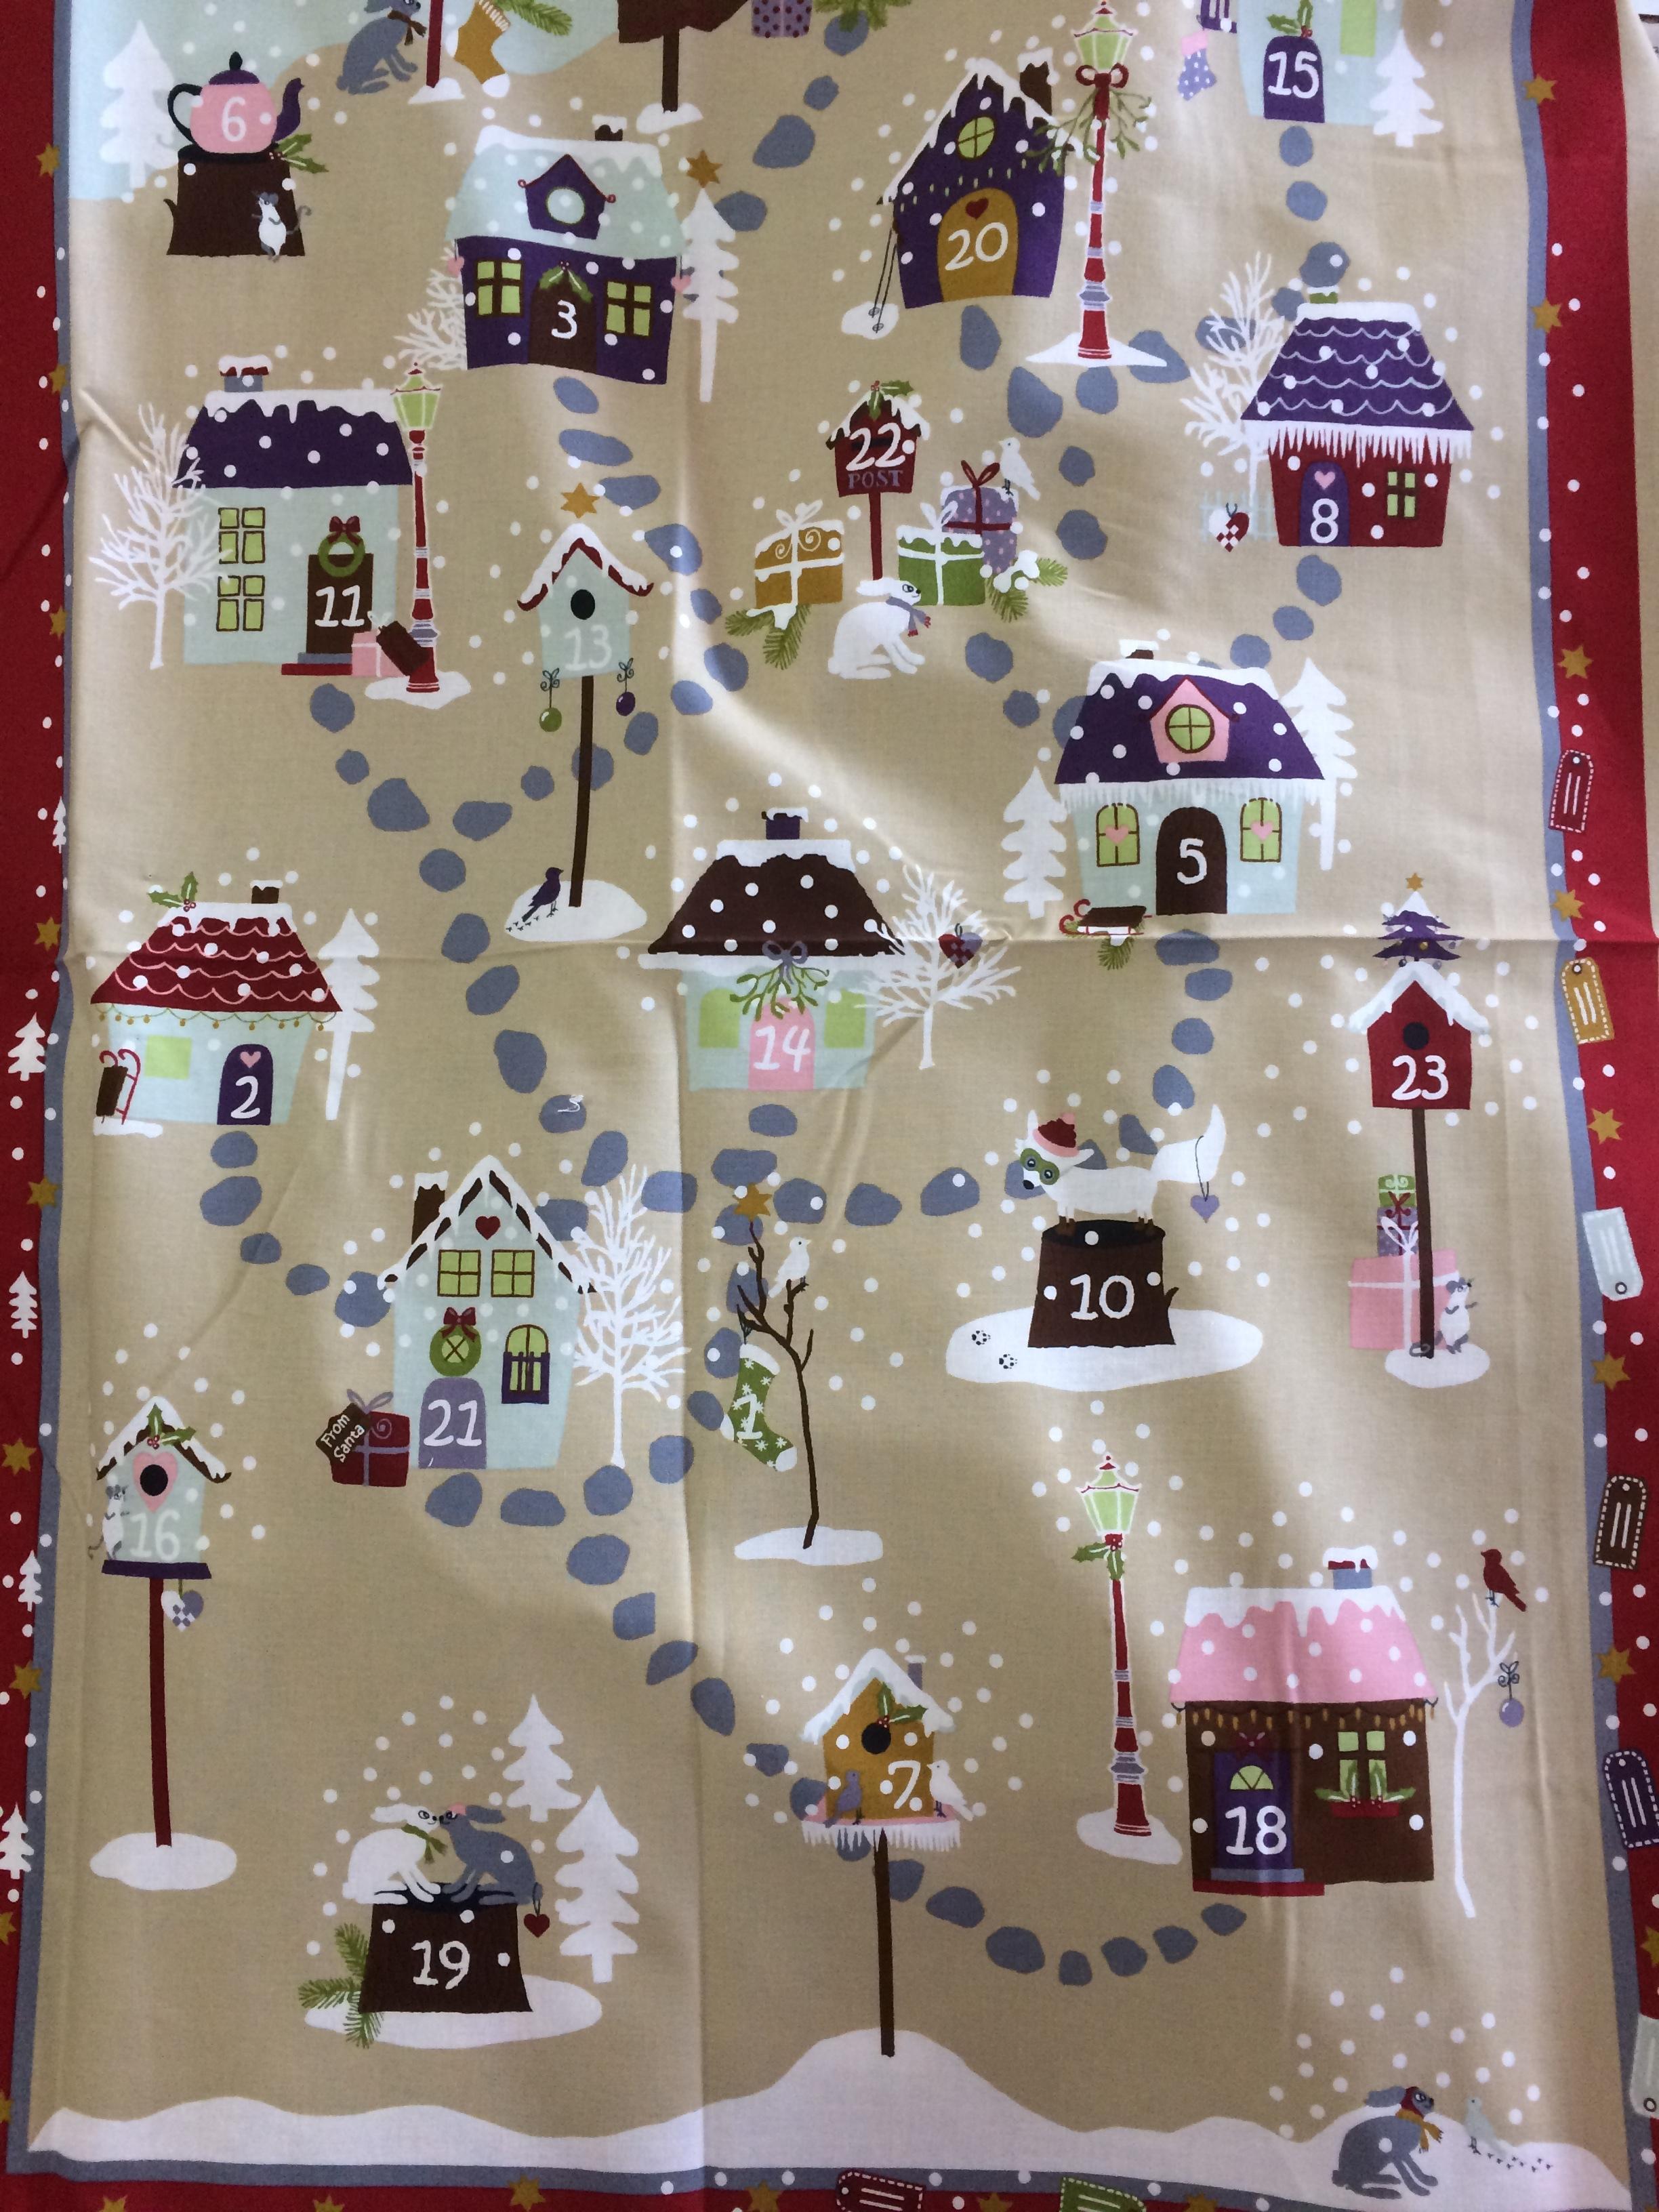 Snow Village Calendar